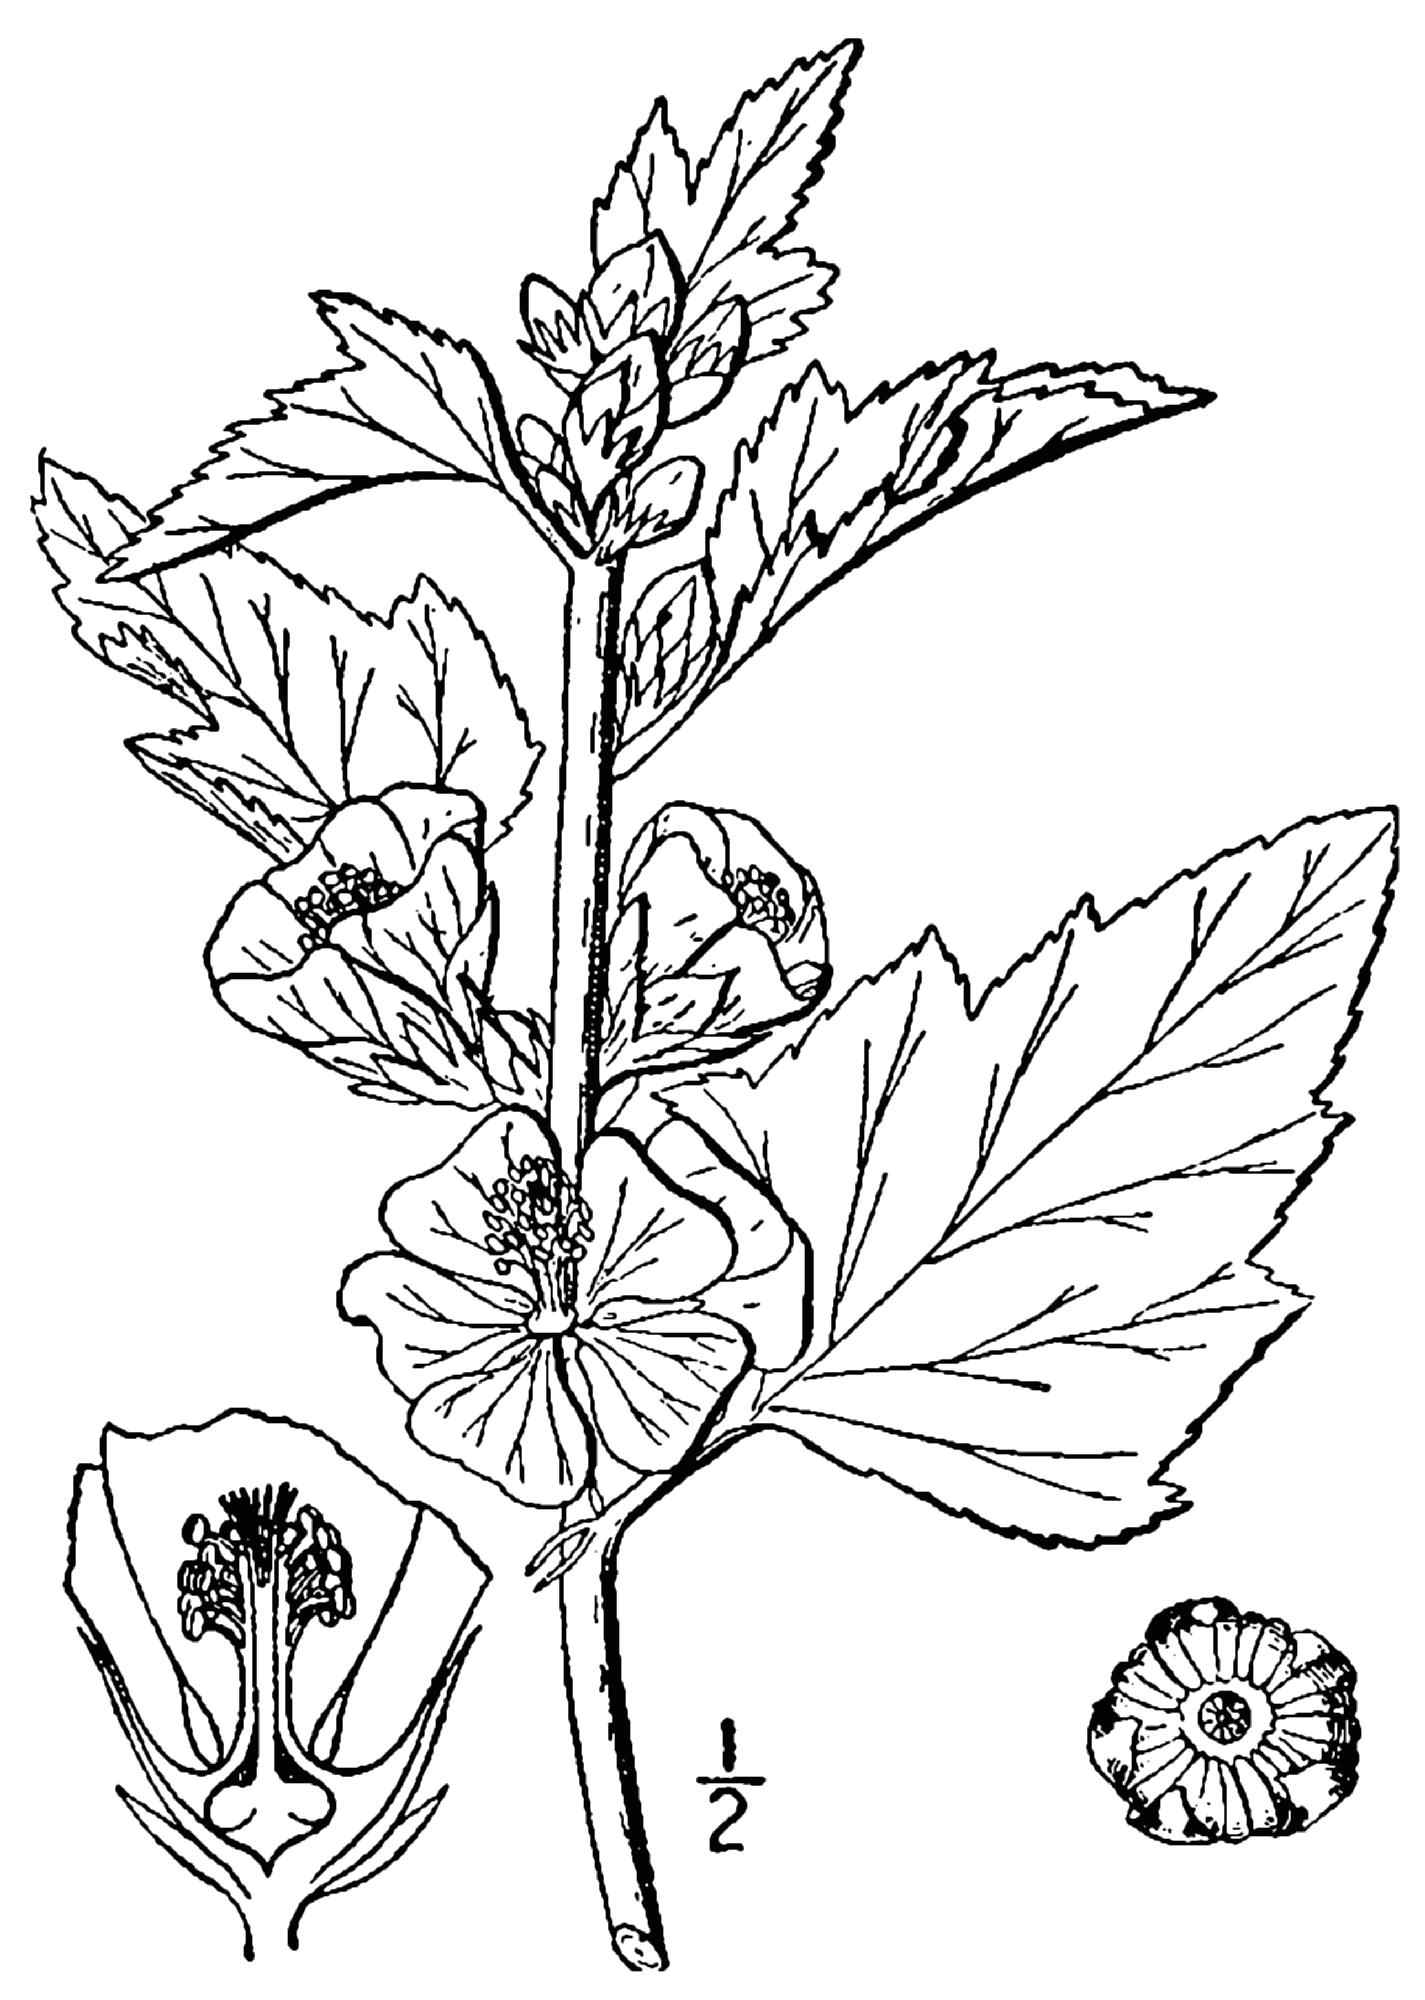 кошке лечебный цветок рисунок жучки могут